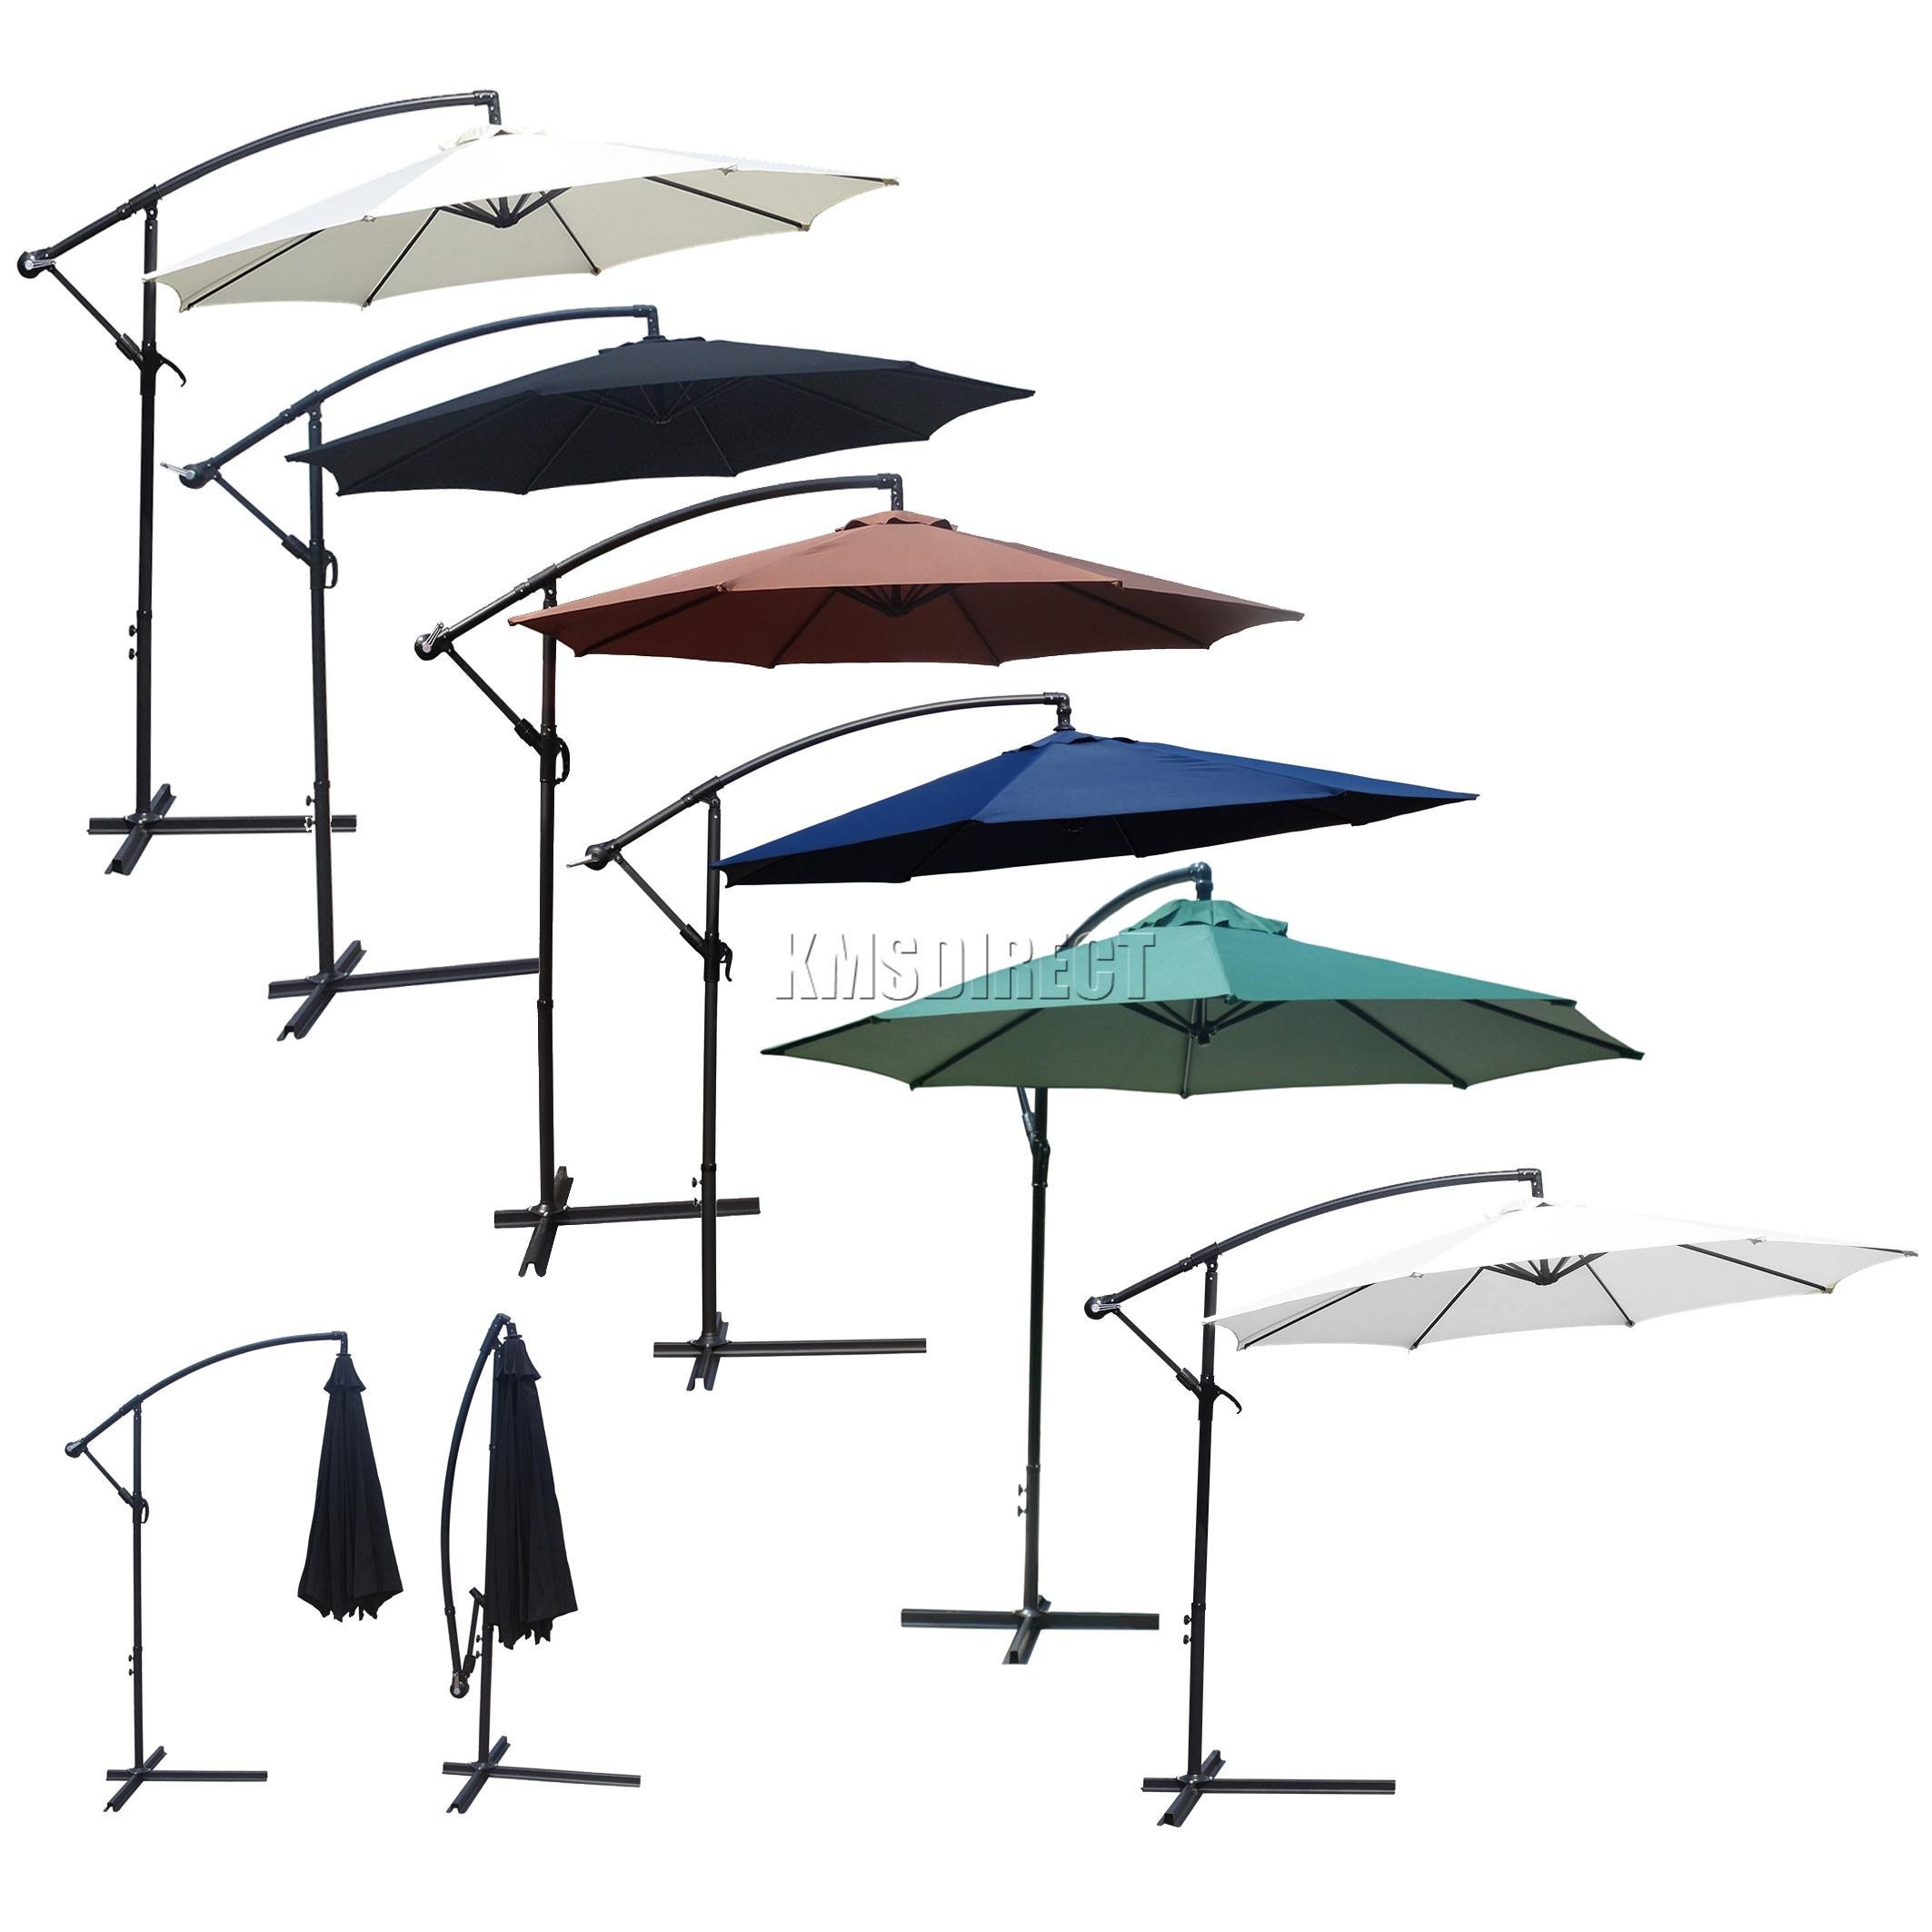 Umbrella Stand Definition: FoxHunter Jardin Parasol Soleil Shade Patio Banane